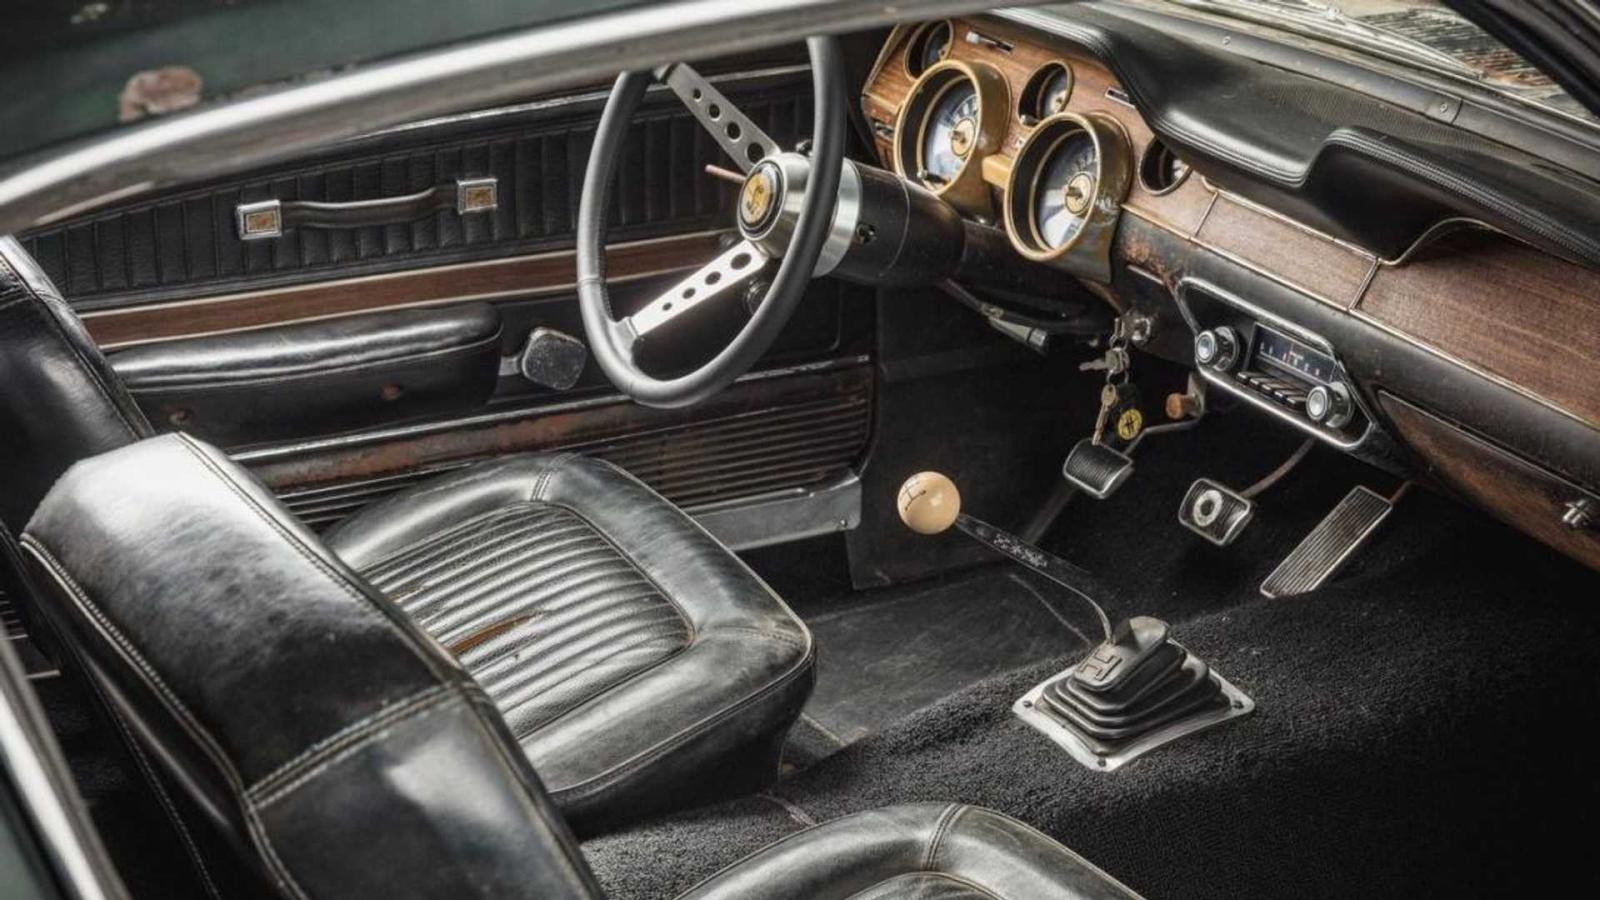 Ford Mustang GT Bullitt 1968